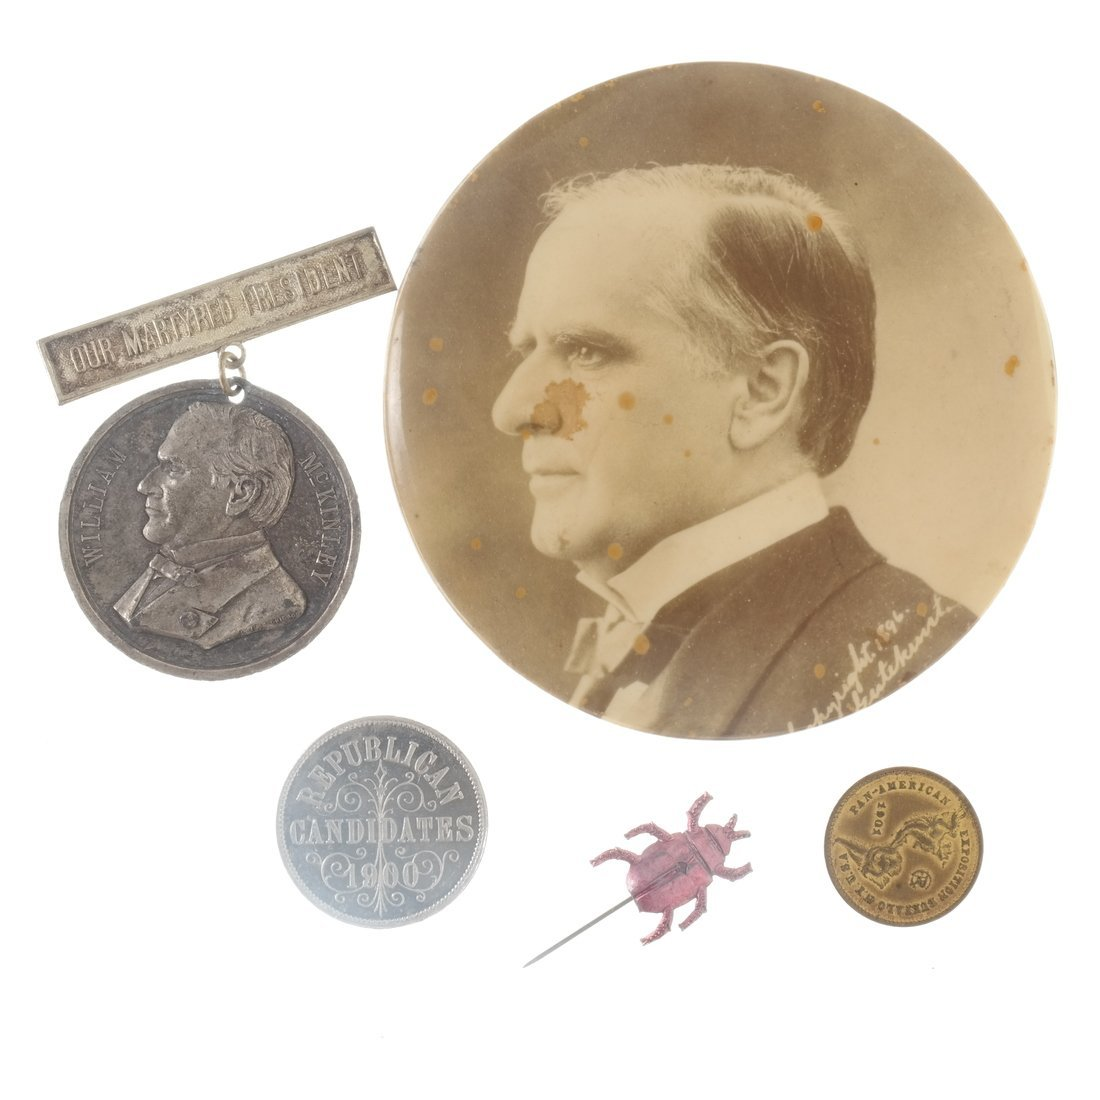 William McKinley - Campaign and Memorial Items - 5